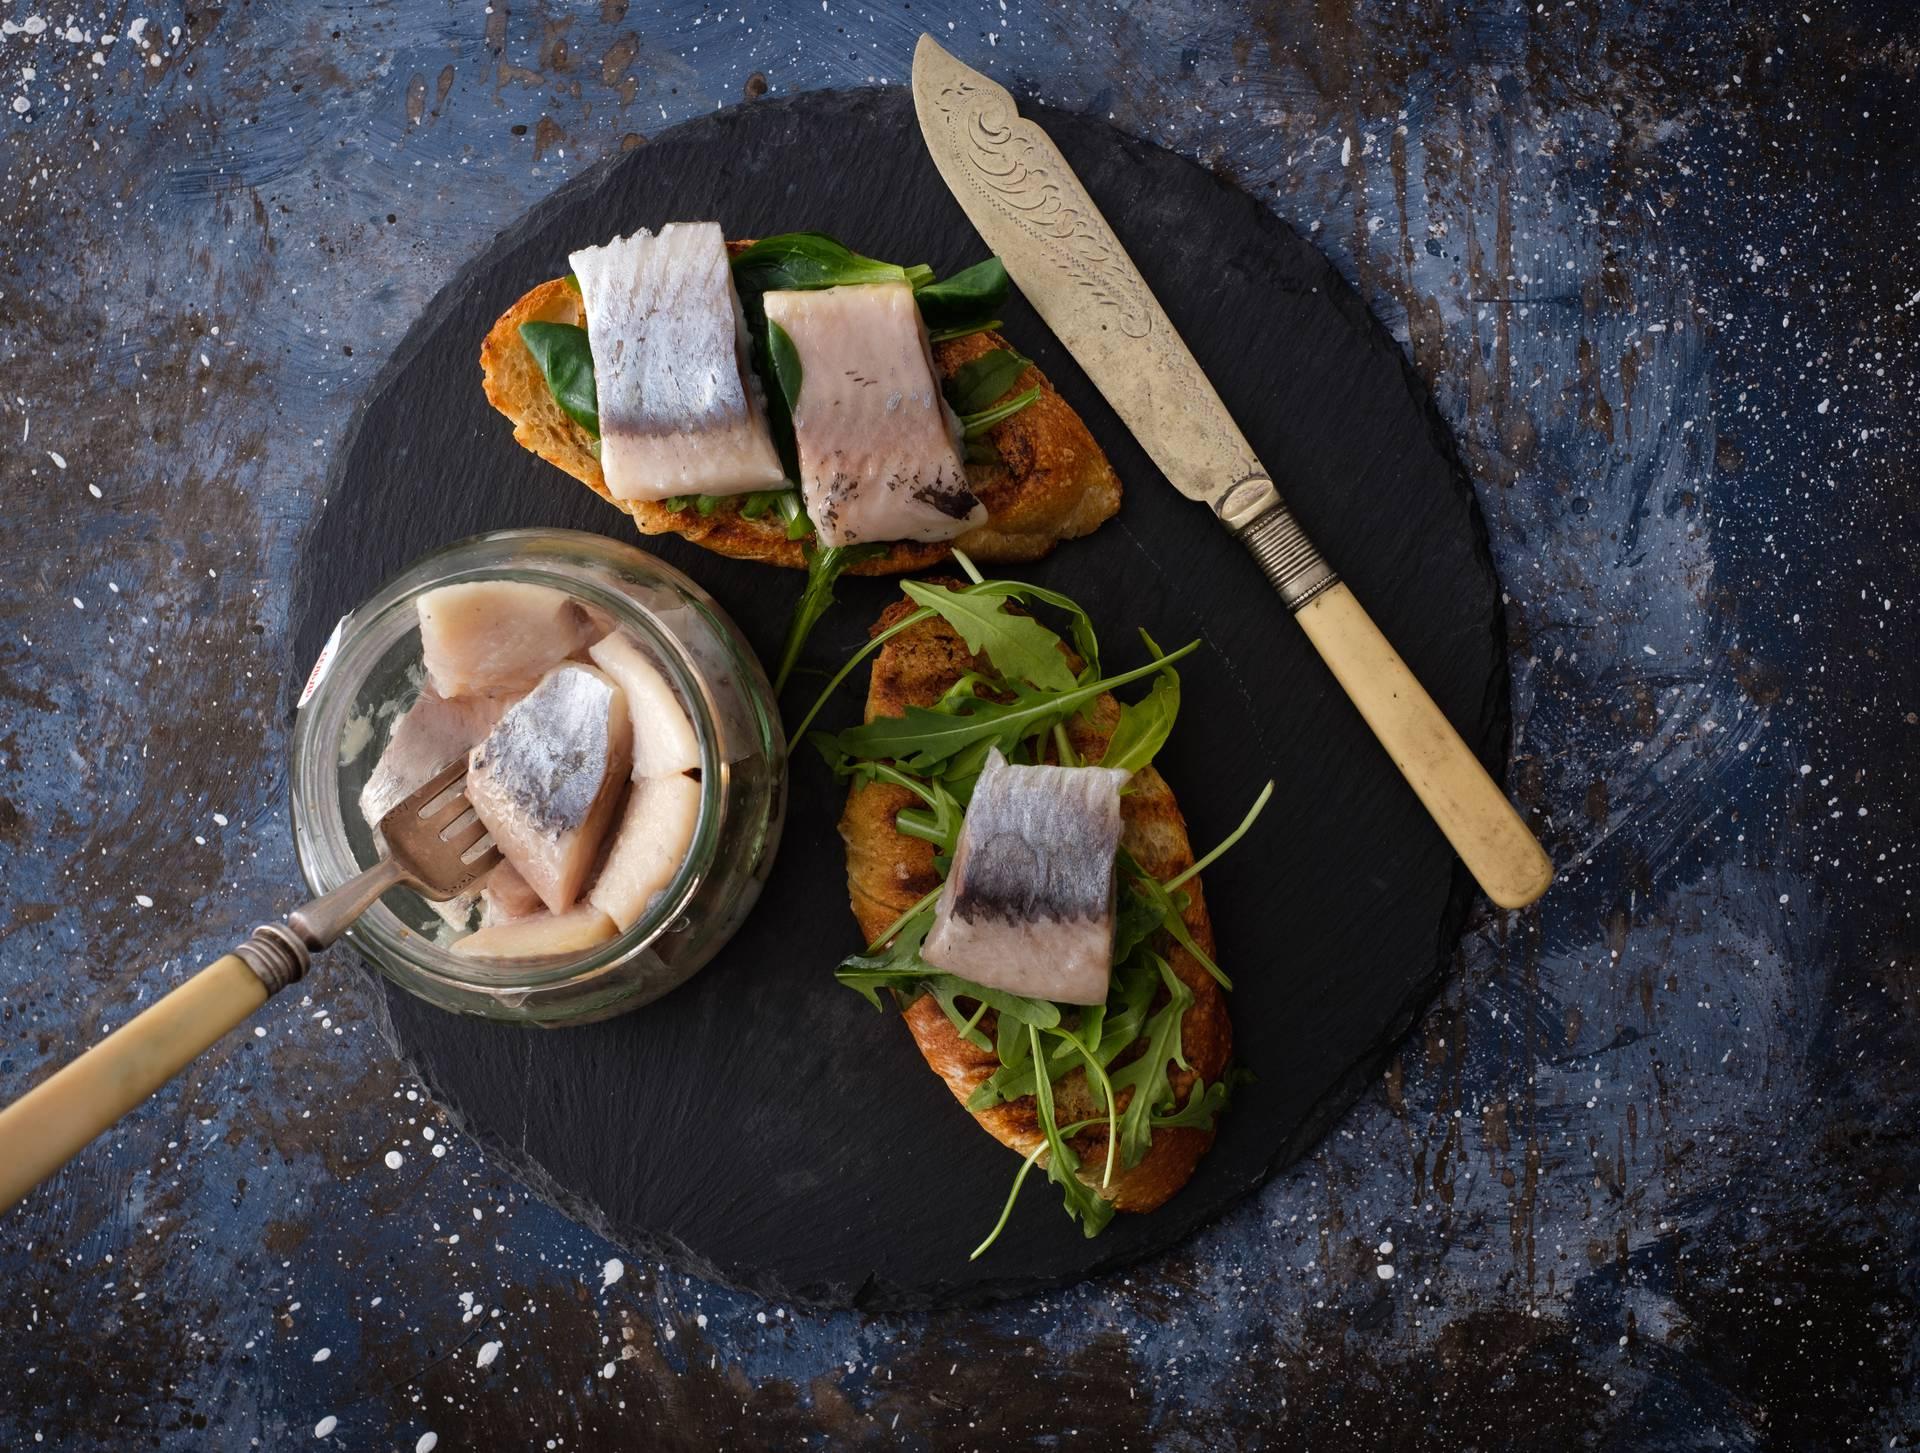 Herring sandwich (traditional Danish smorrebrod) on cutting boar